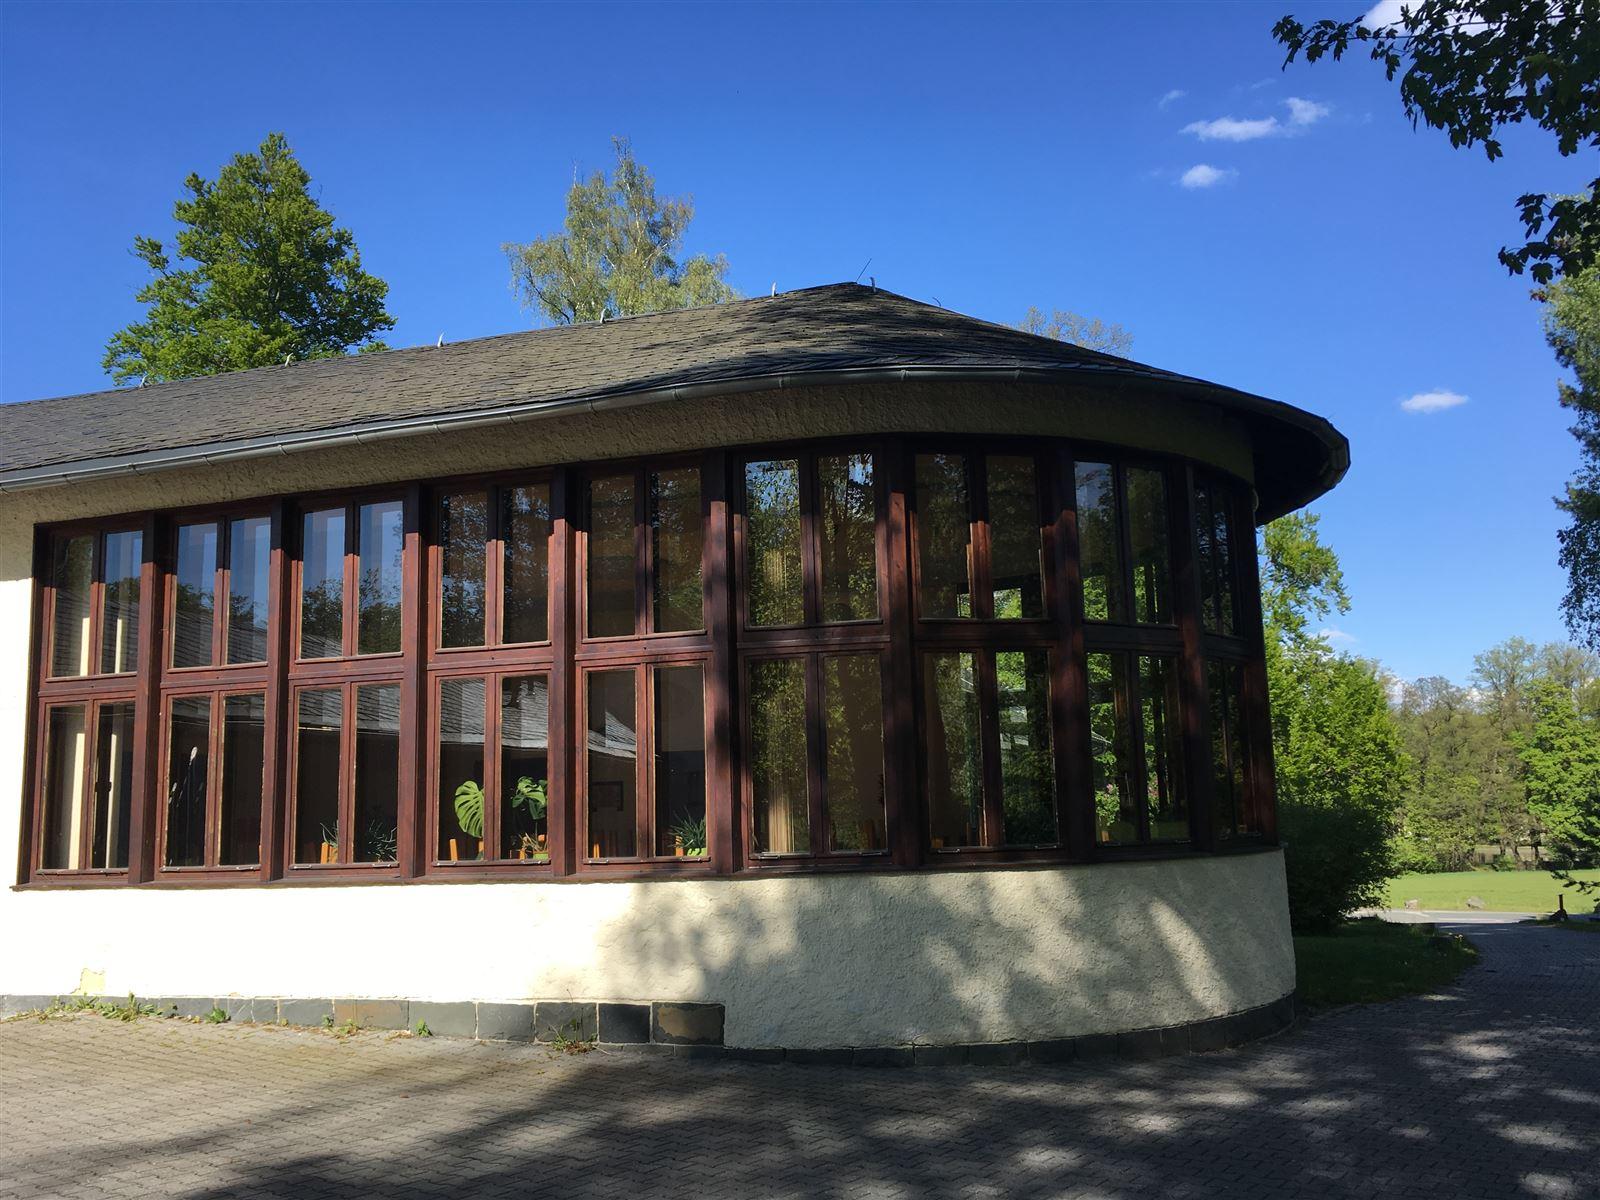 Ausflug: Landschaftspark Ebersdorf - Thüringen - nahe der Bleilochtalsperre - Schule